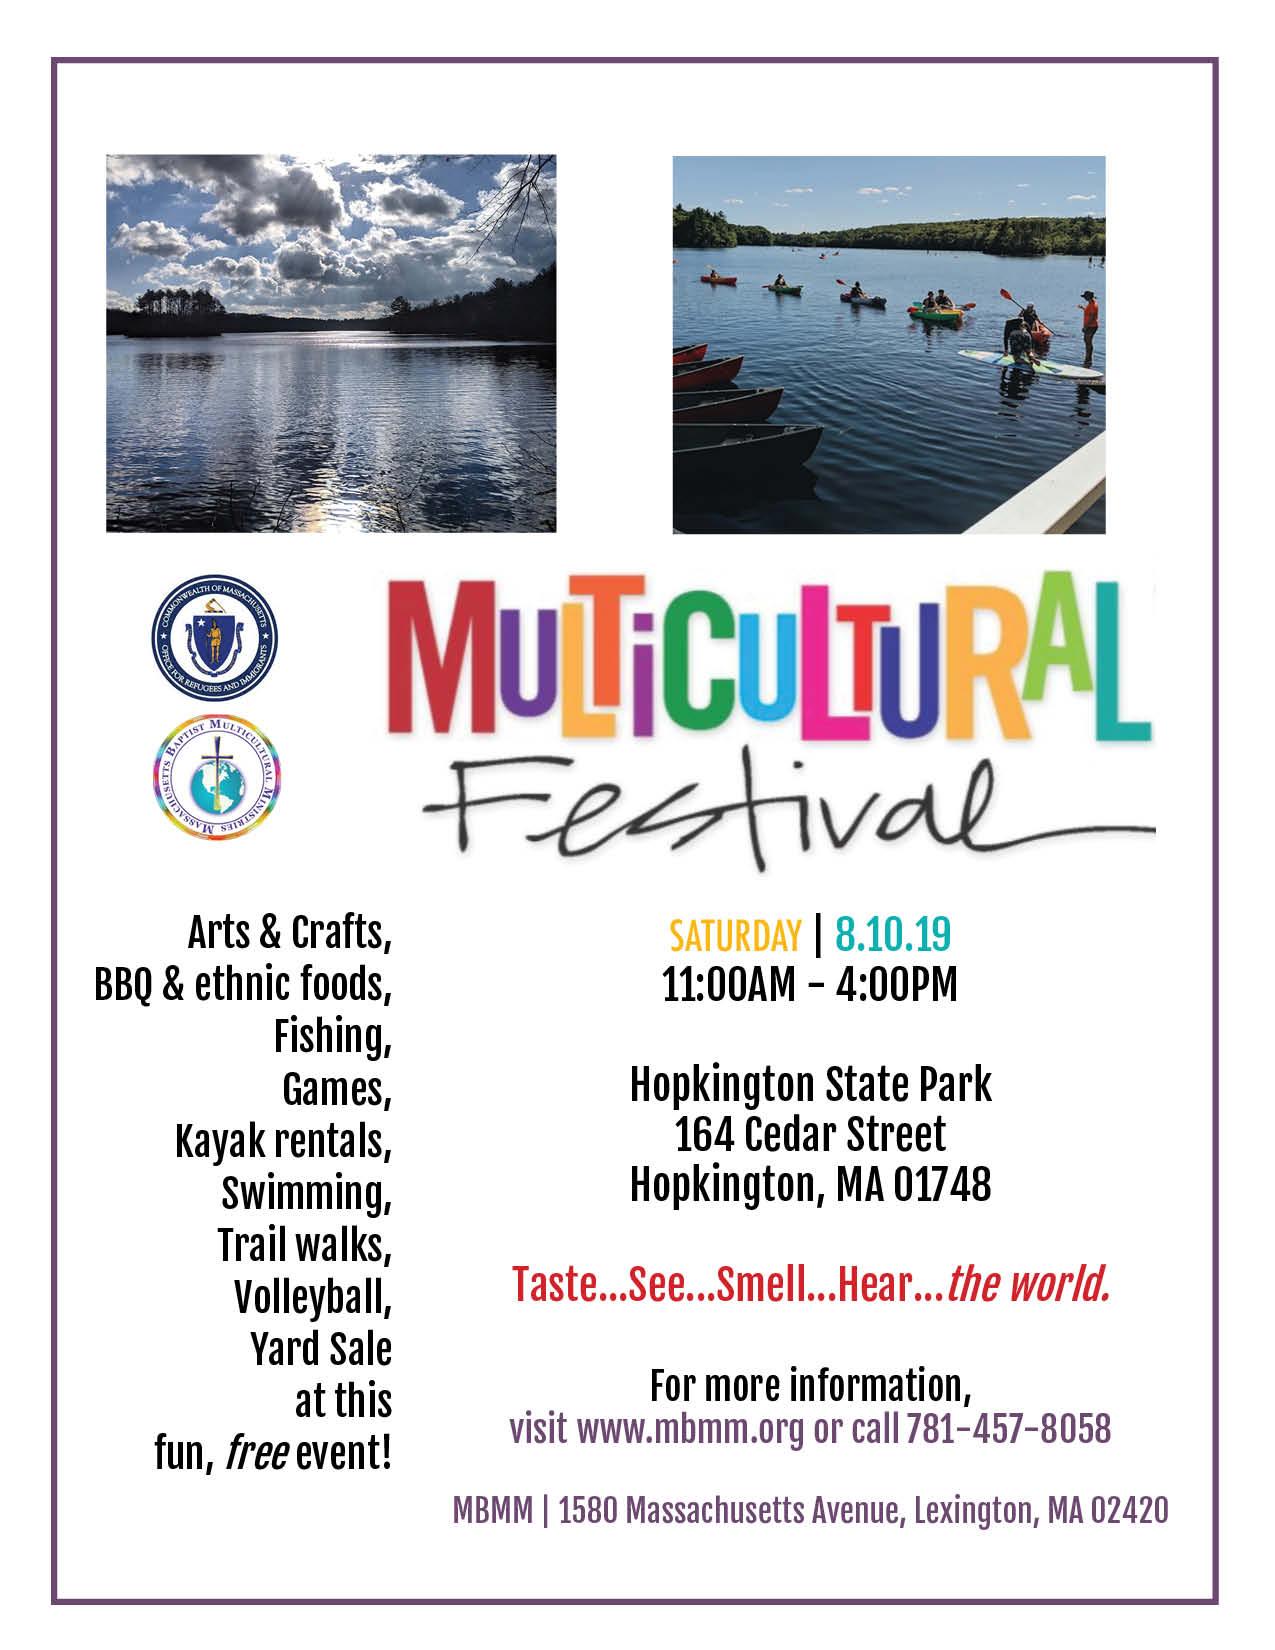 multicultural festival flier.jpg